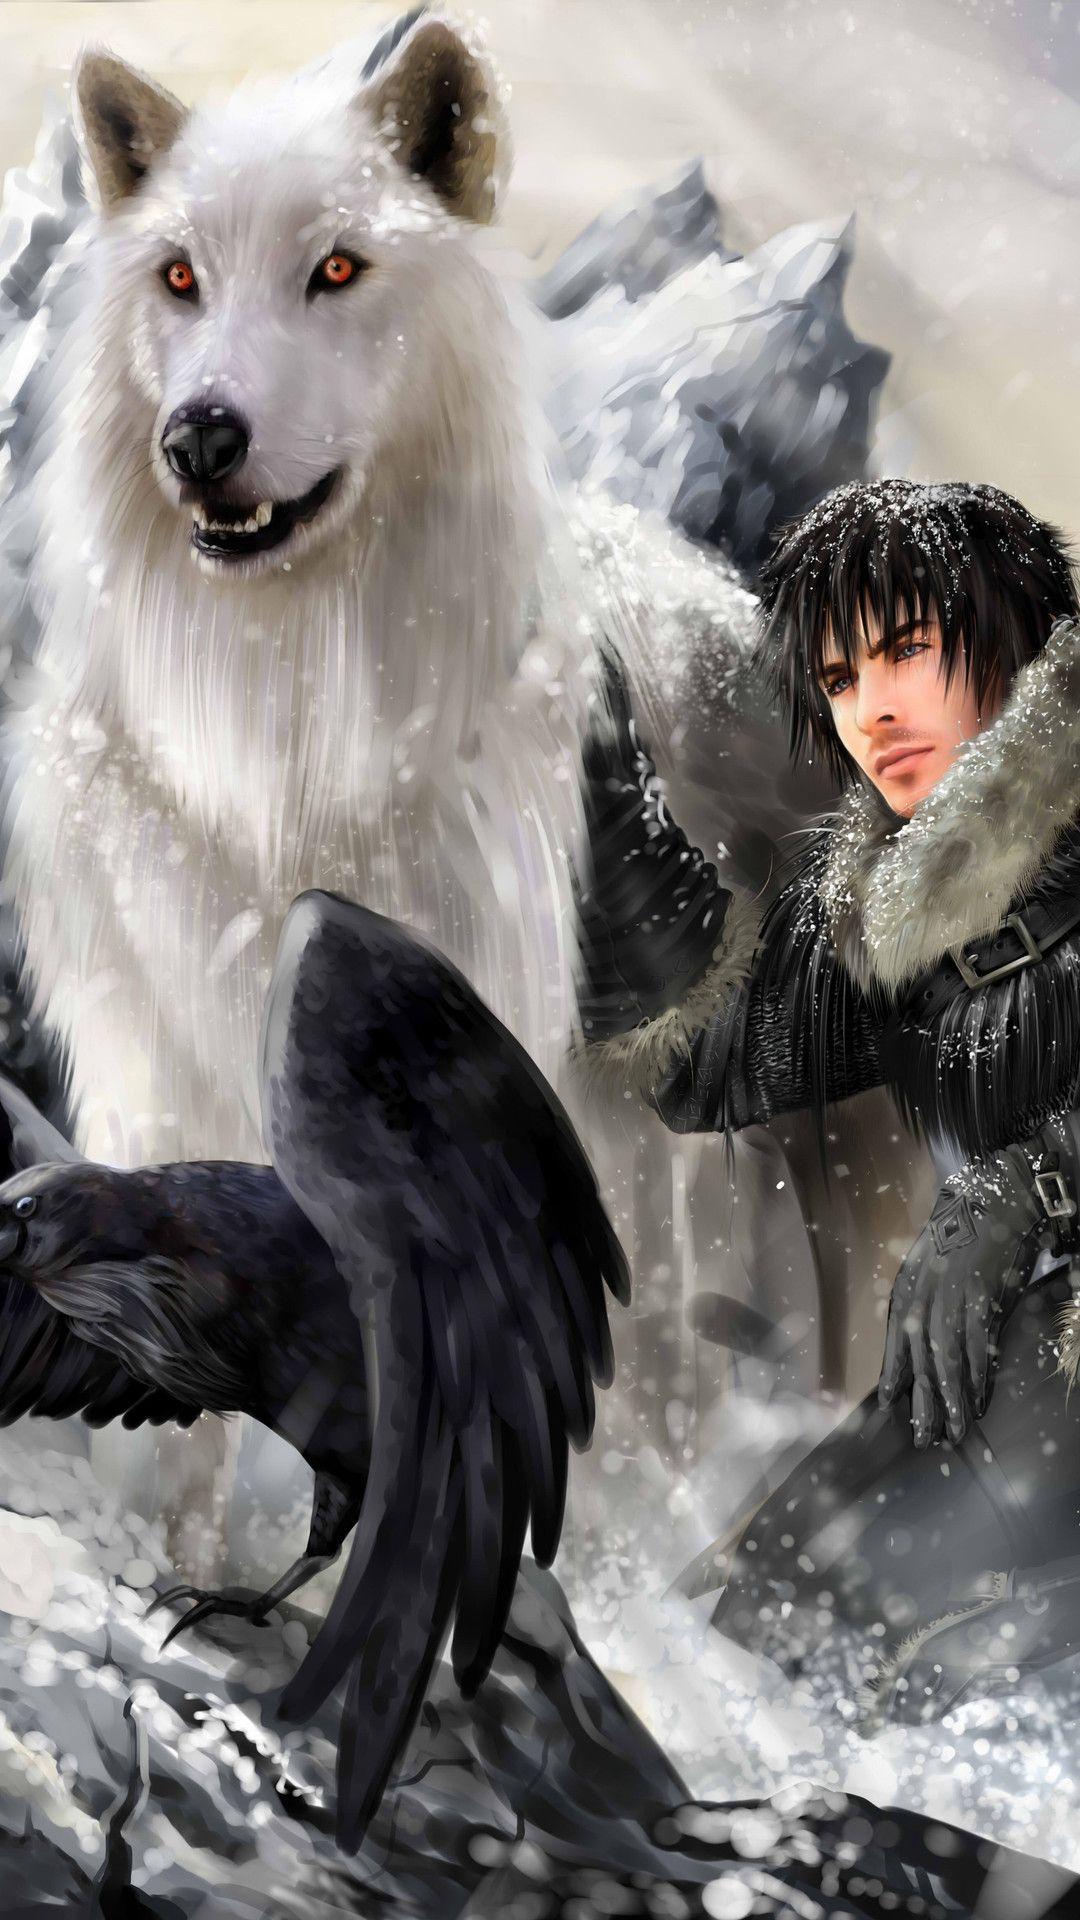 Jon Snow Targaryen 5k Mobile Wallpaper (iPhone, Android